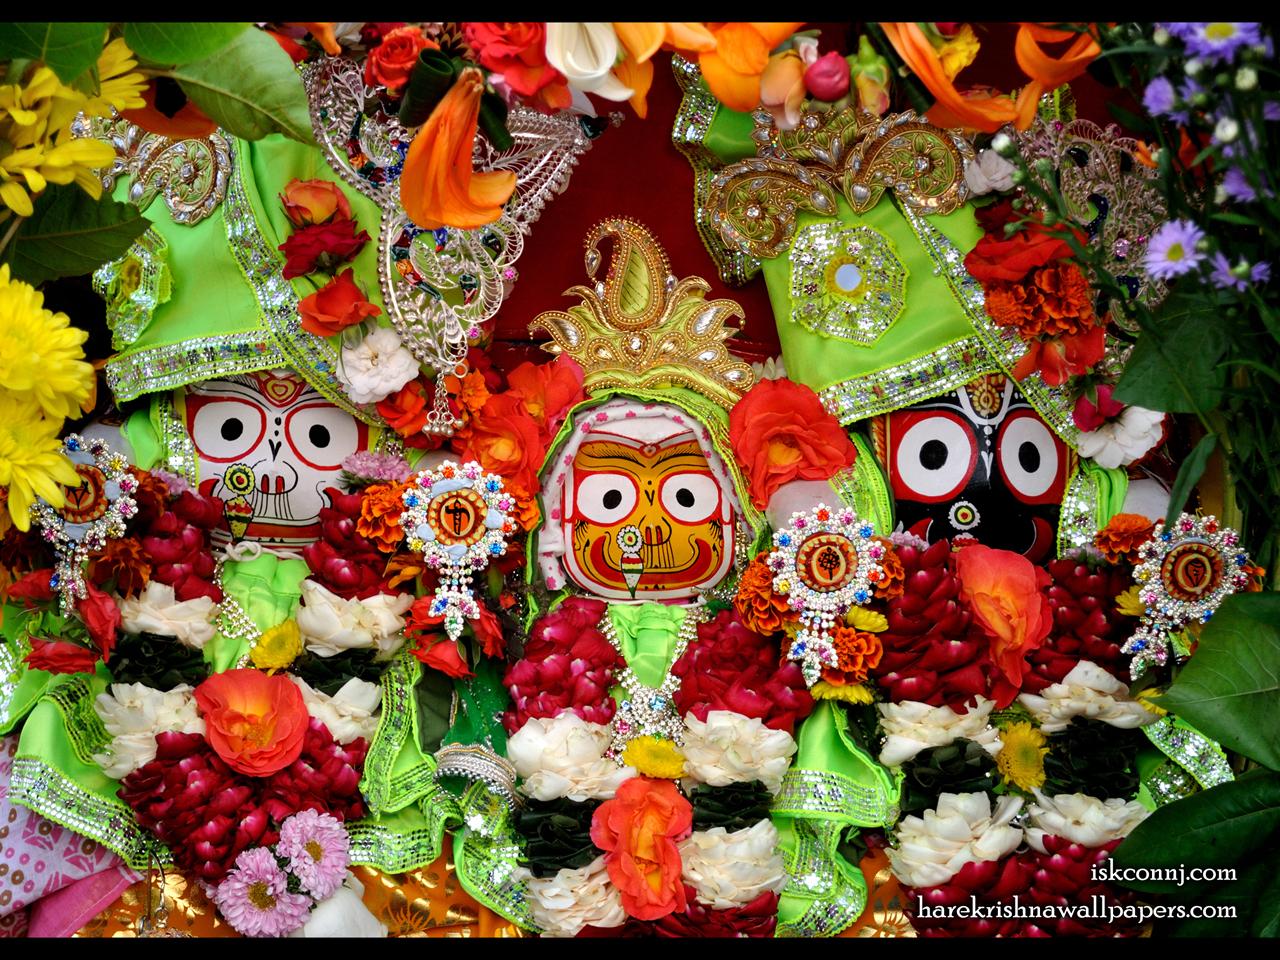 Jagannath Baladeva Subhadra Wallpaper (006) Size 1280x960 Download